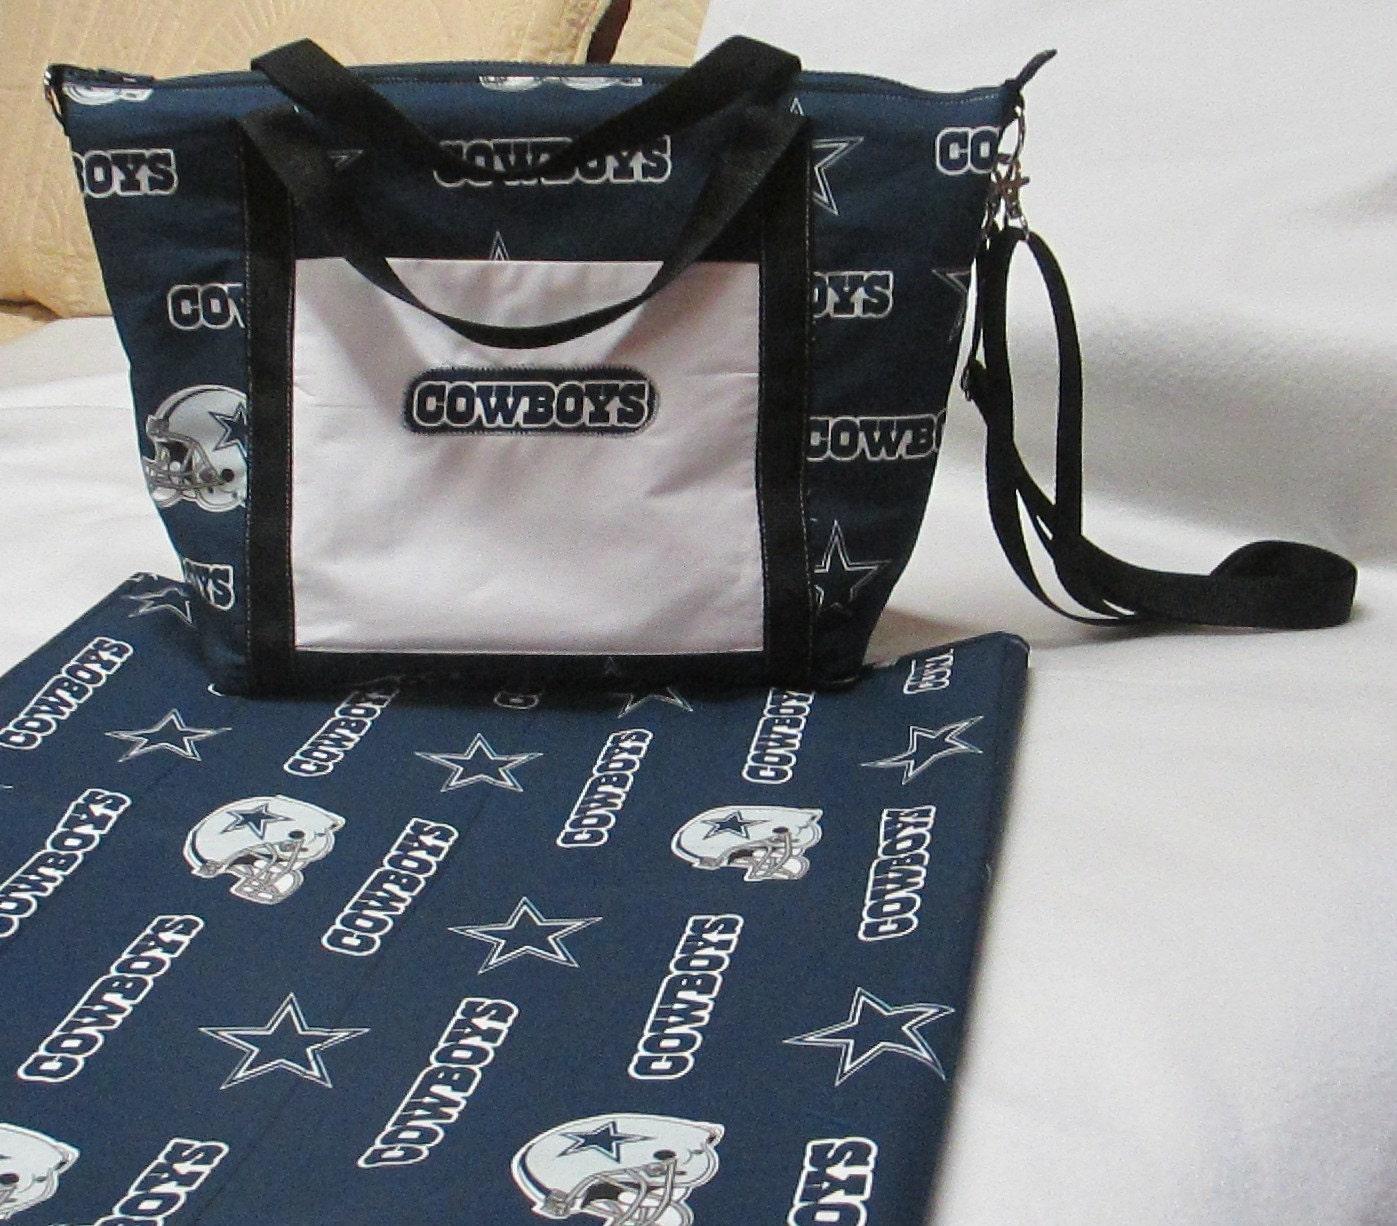 Cowboy Diaper Bags : Clearance priced handmade dallas cowboys diaper bag and